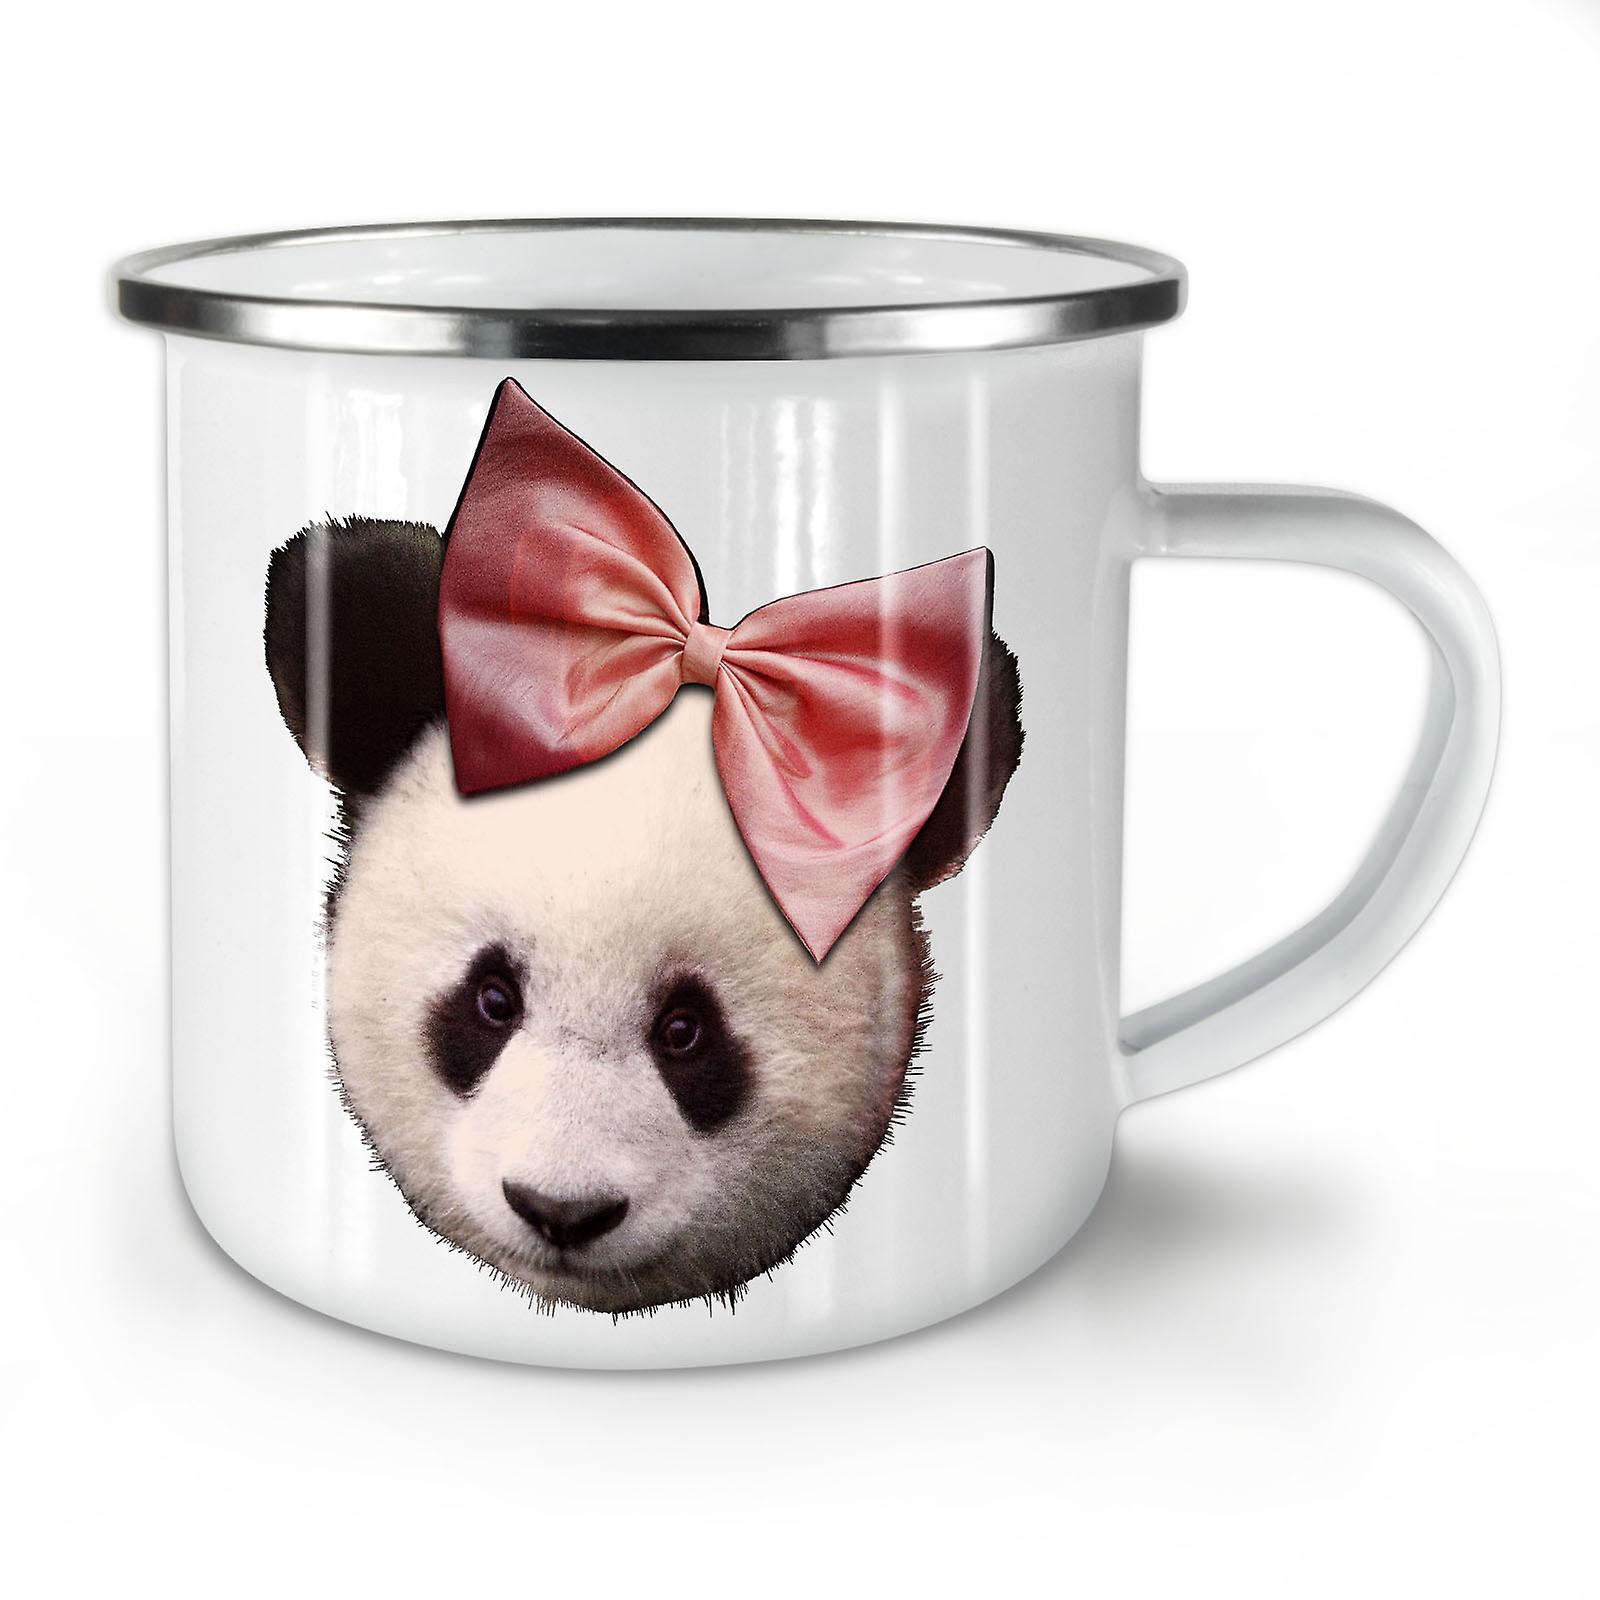 Mignon Panda OzWellcoda Ruban Nouveau Mug10 Café Whitetea Émail Lq4R3A5j